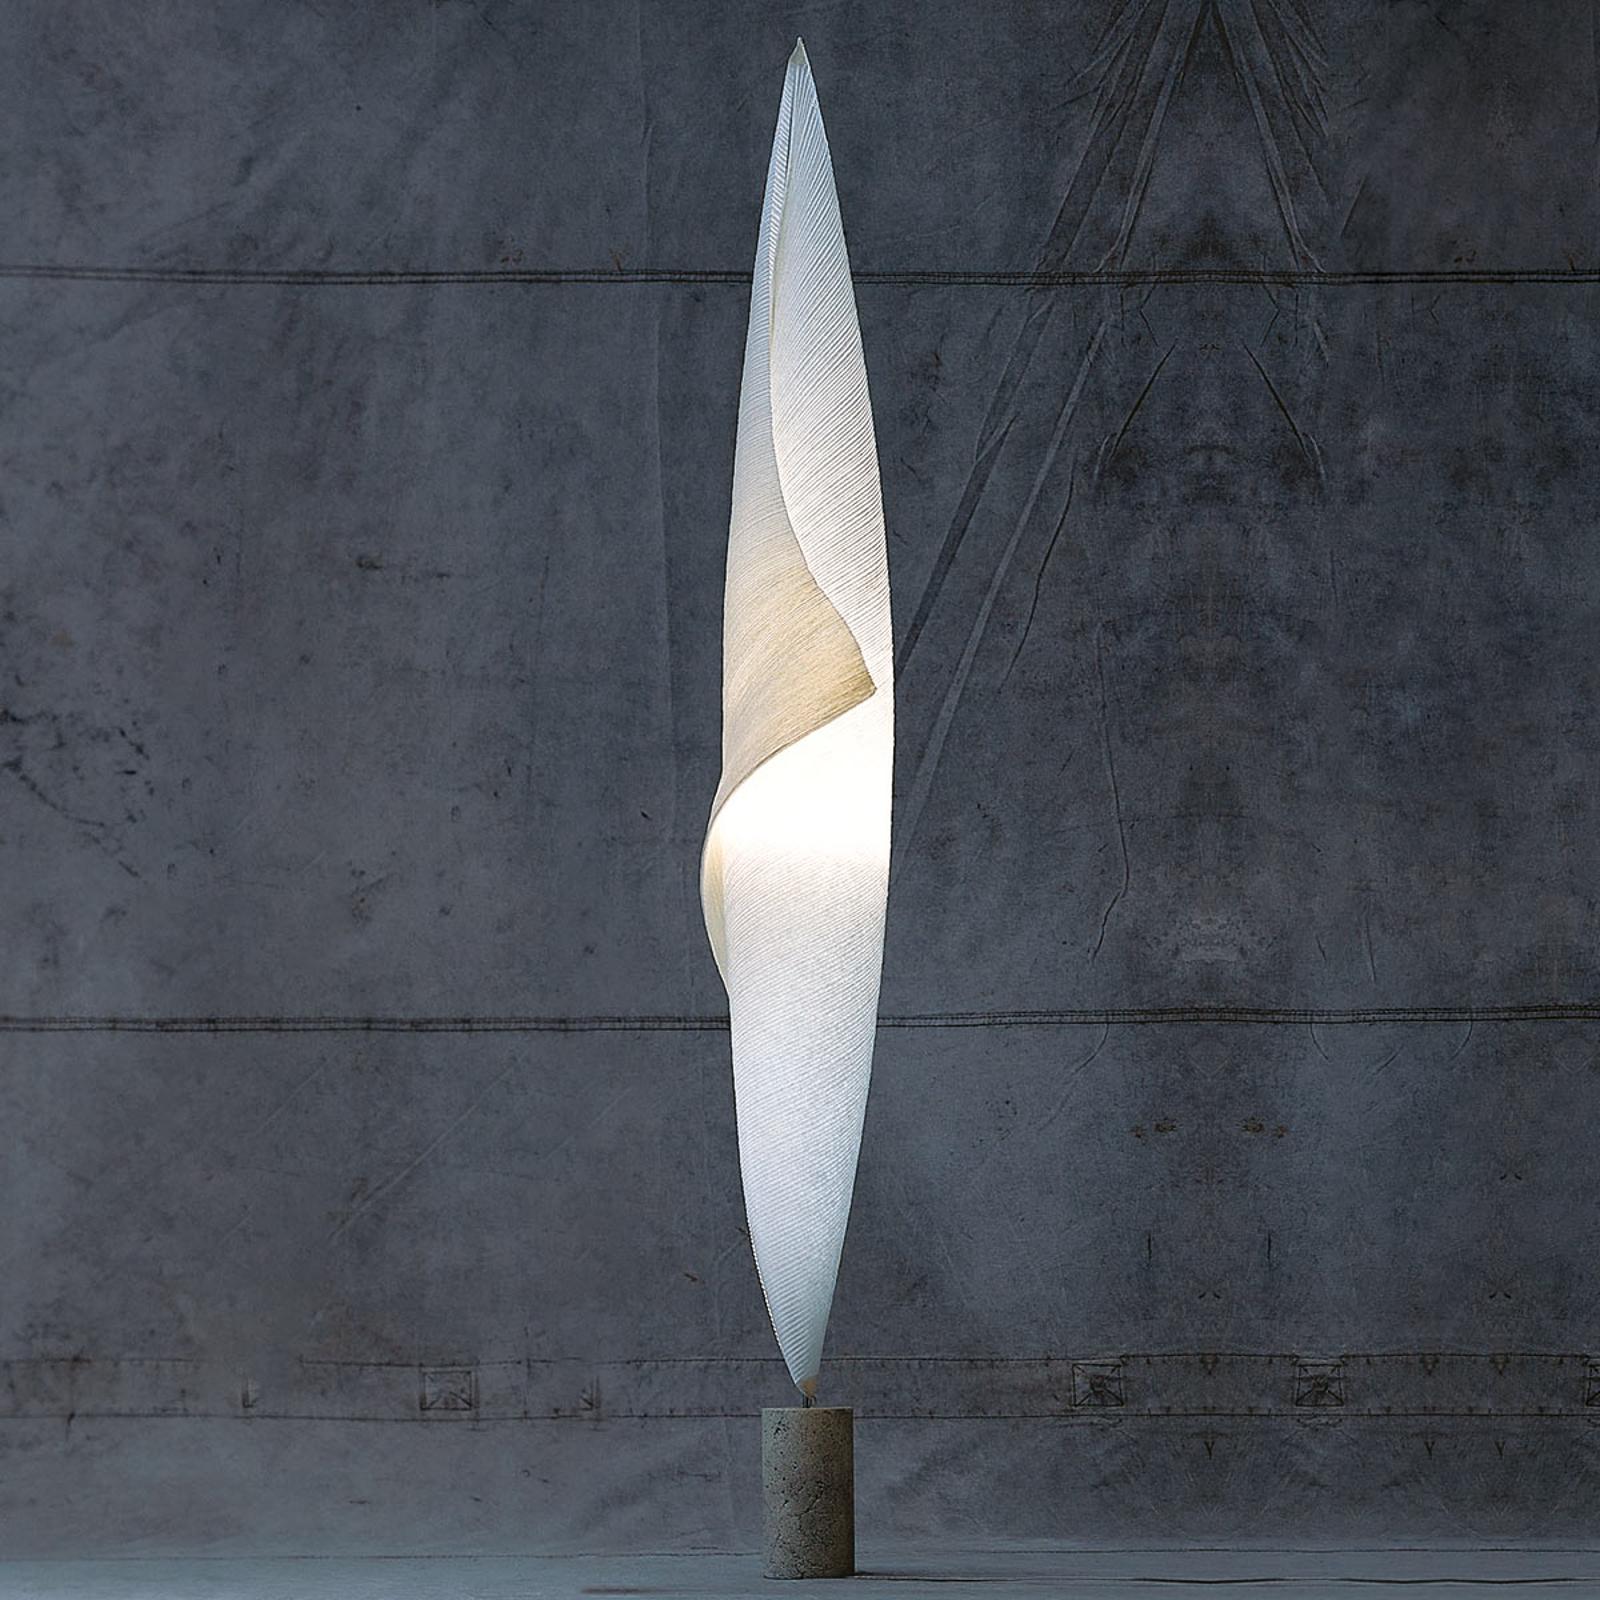 Cocon-achtige vloerlamp Wo-Tum-Bu 1 met dimmer